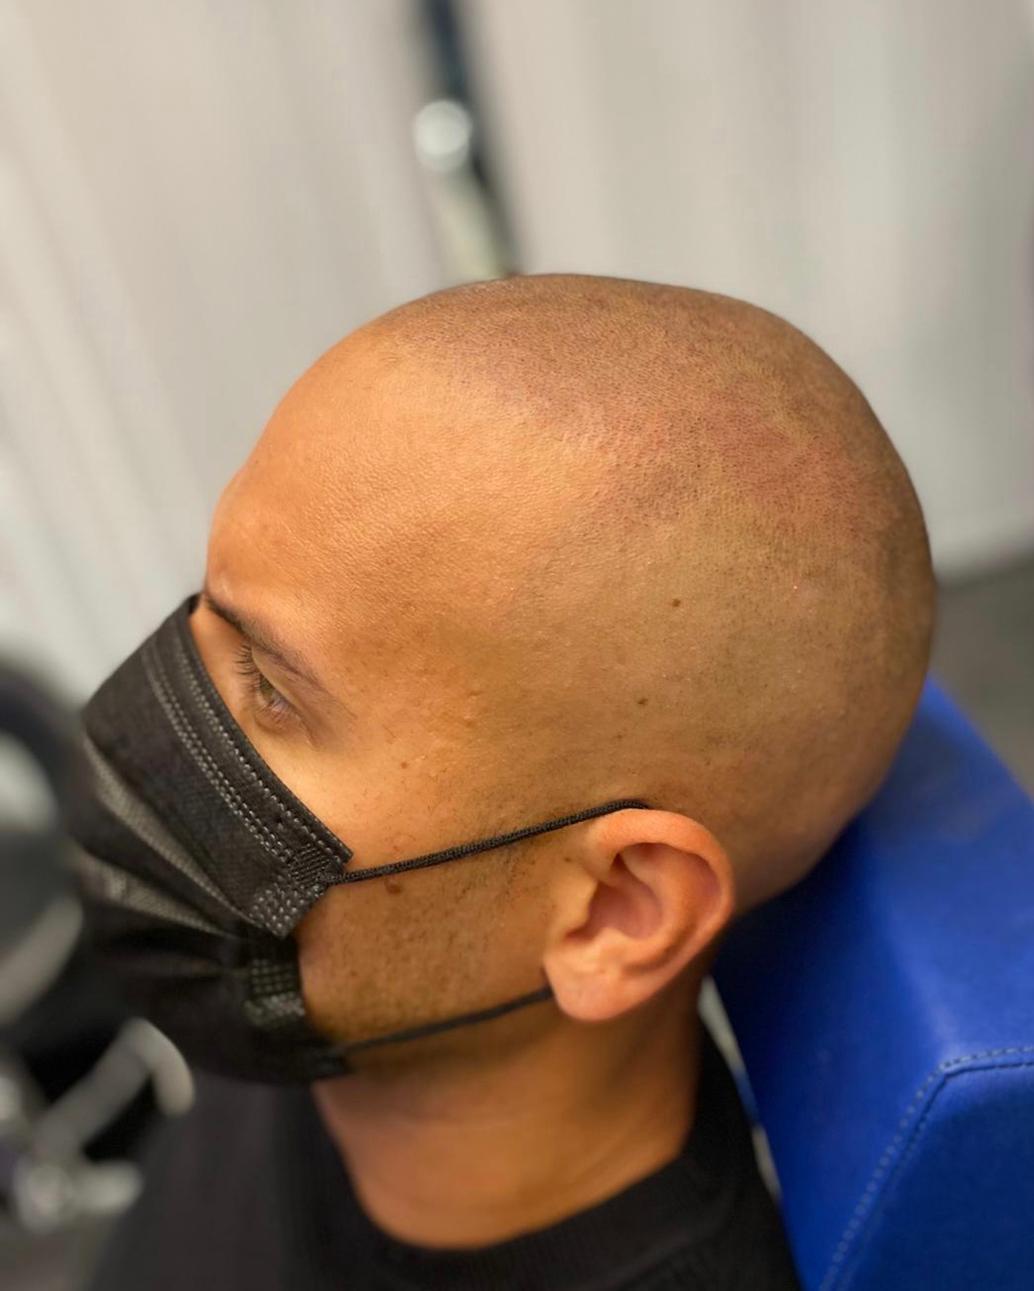 Naturlig hårlinje